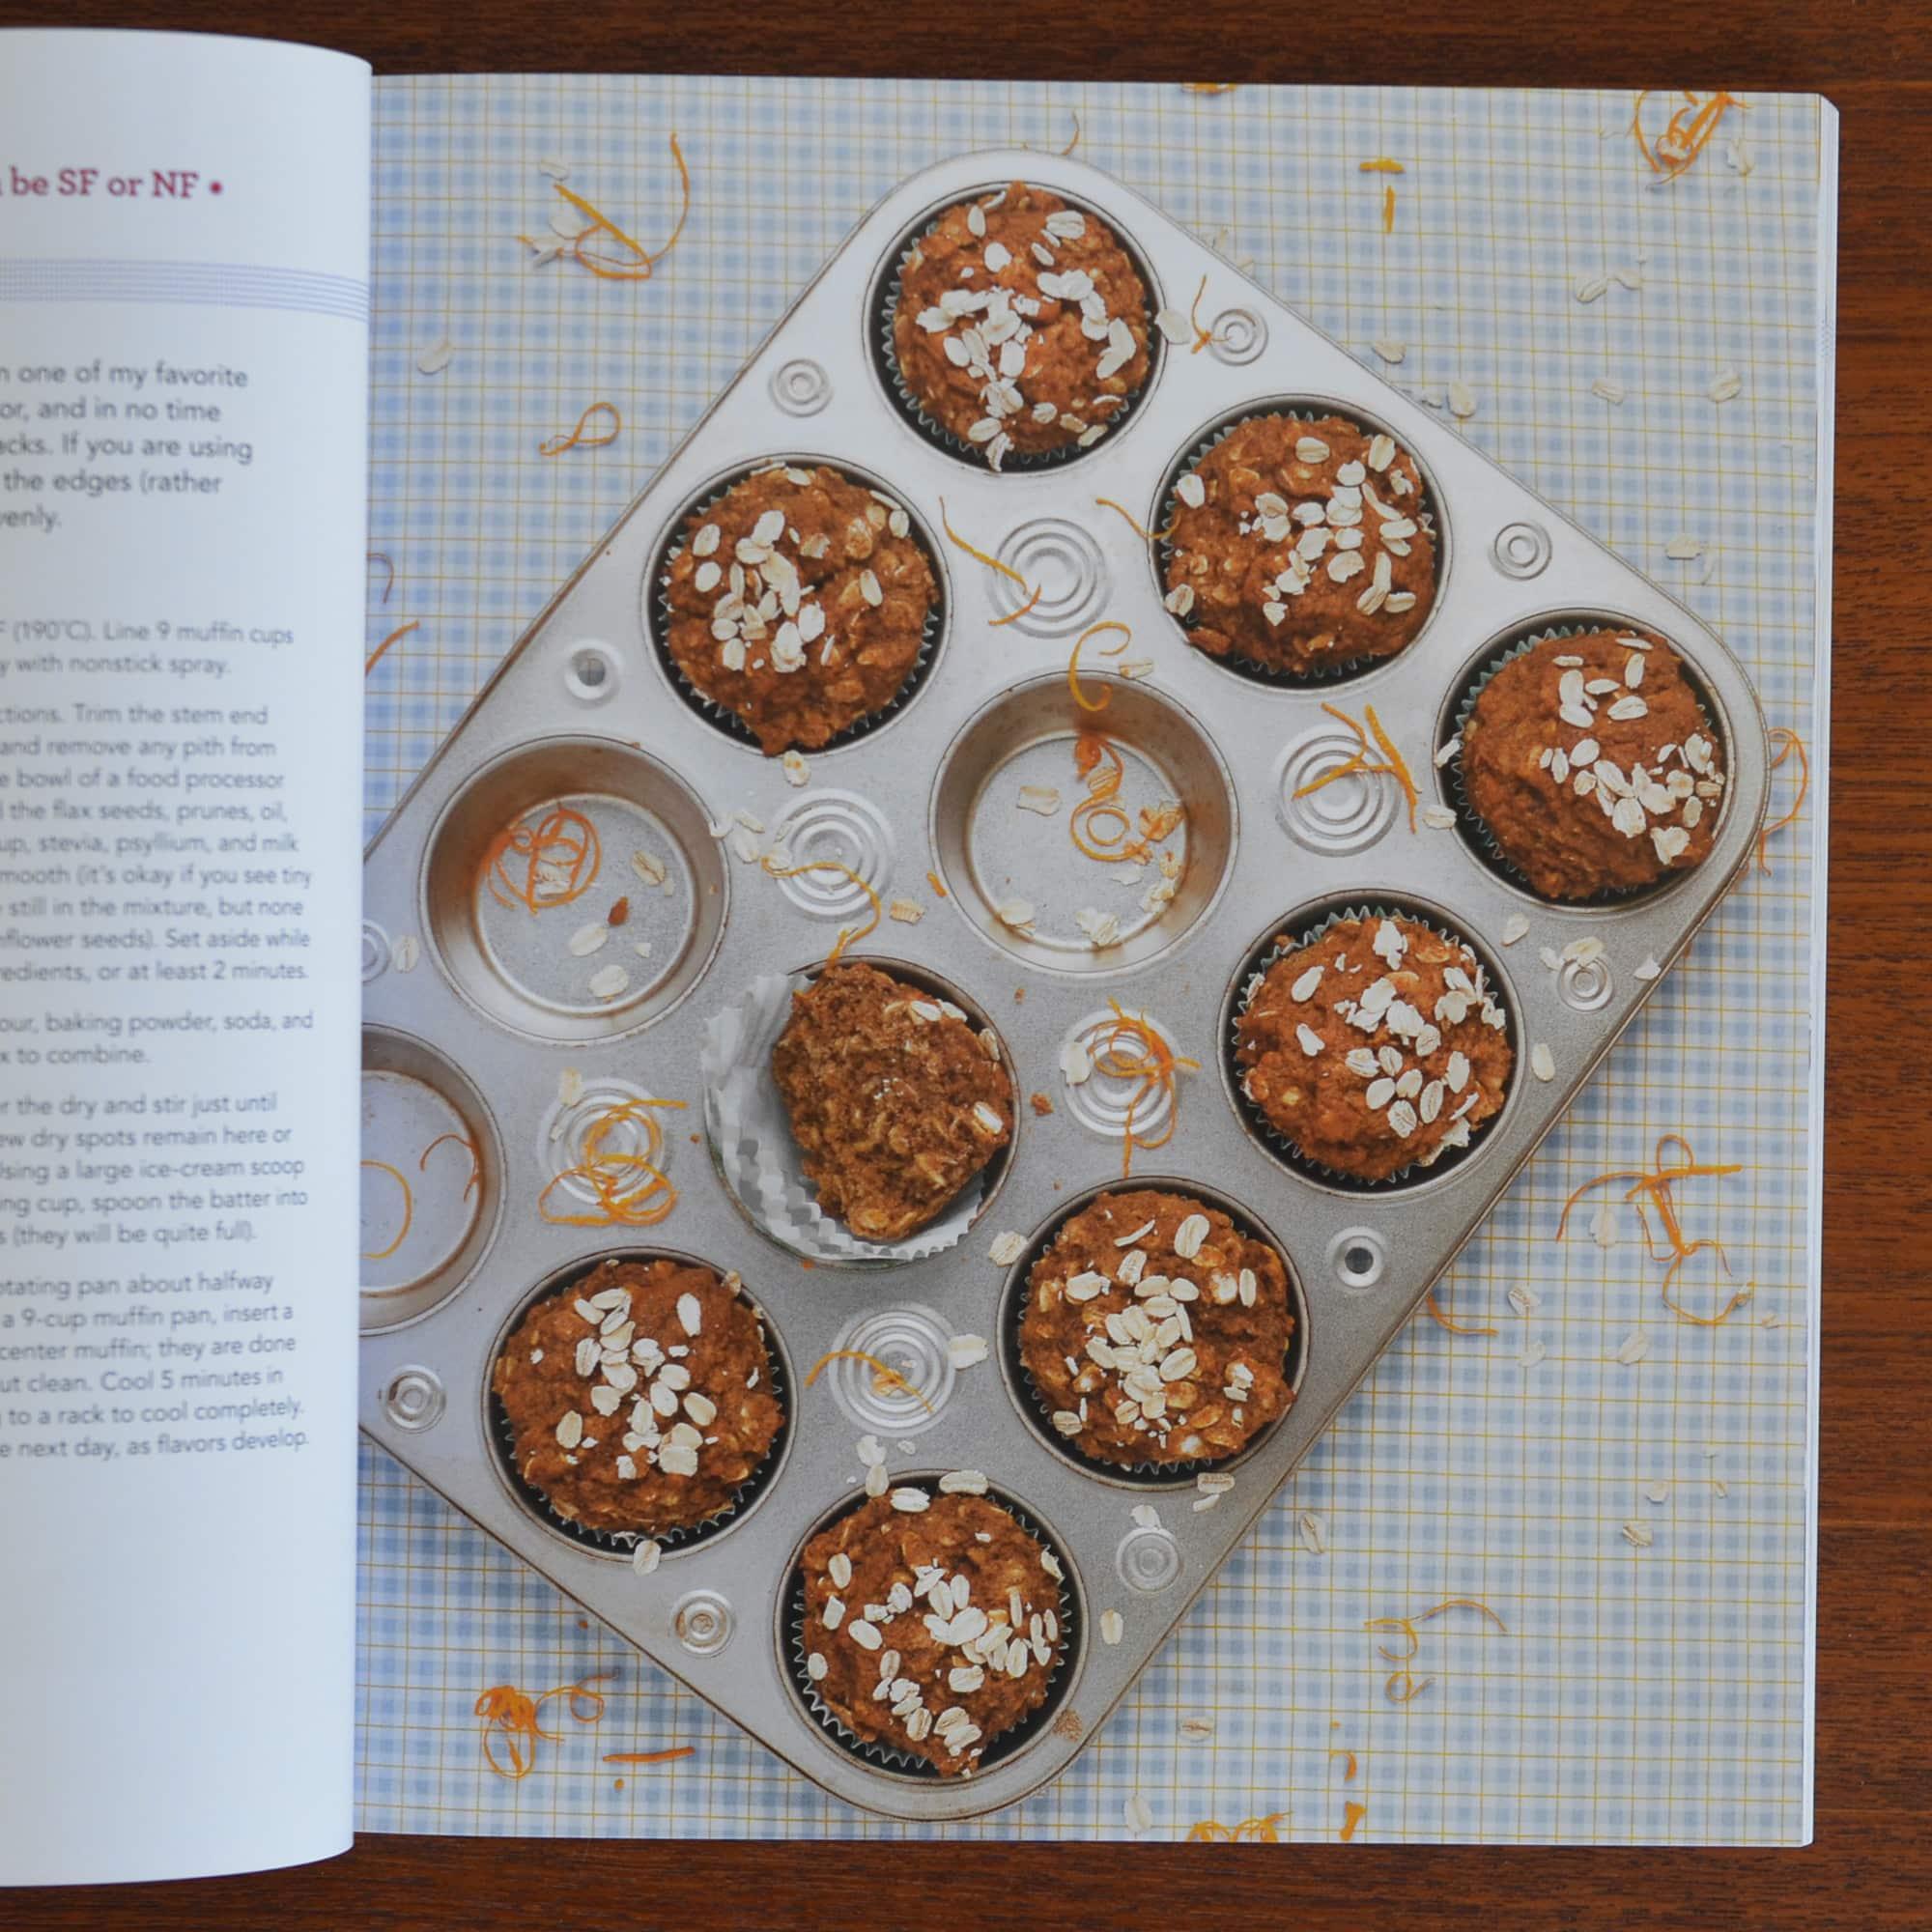 Naturally Sweet & Gluten-Free by Ricki Heller: gallery image 2